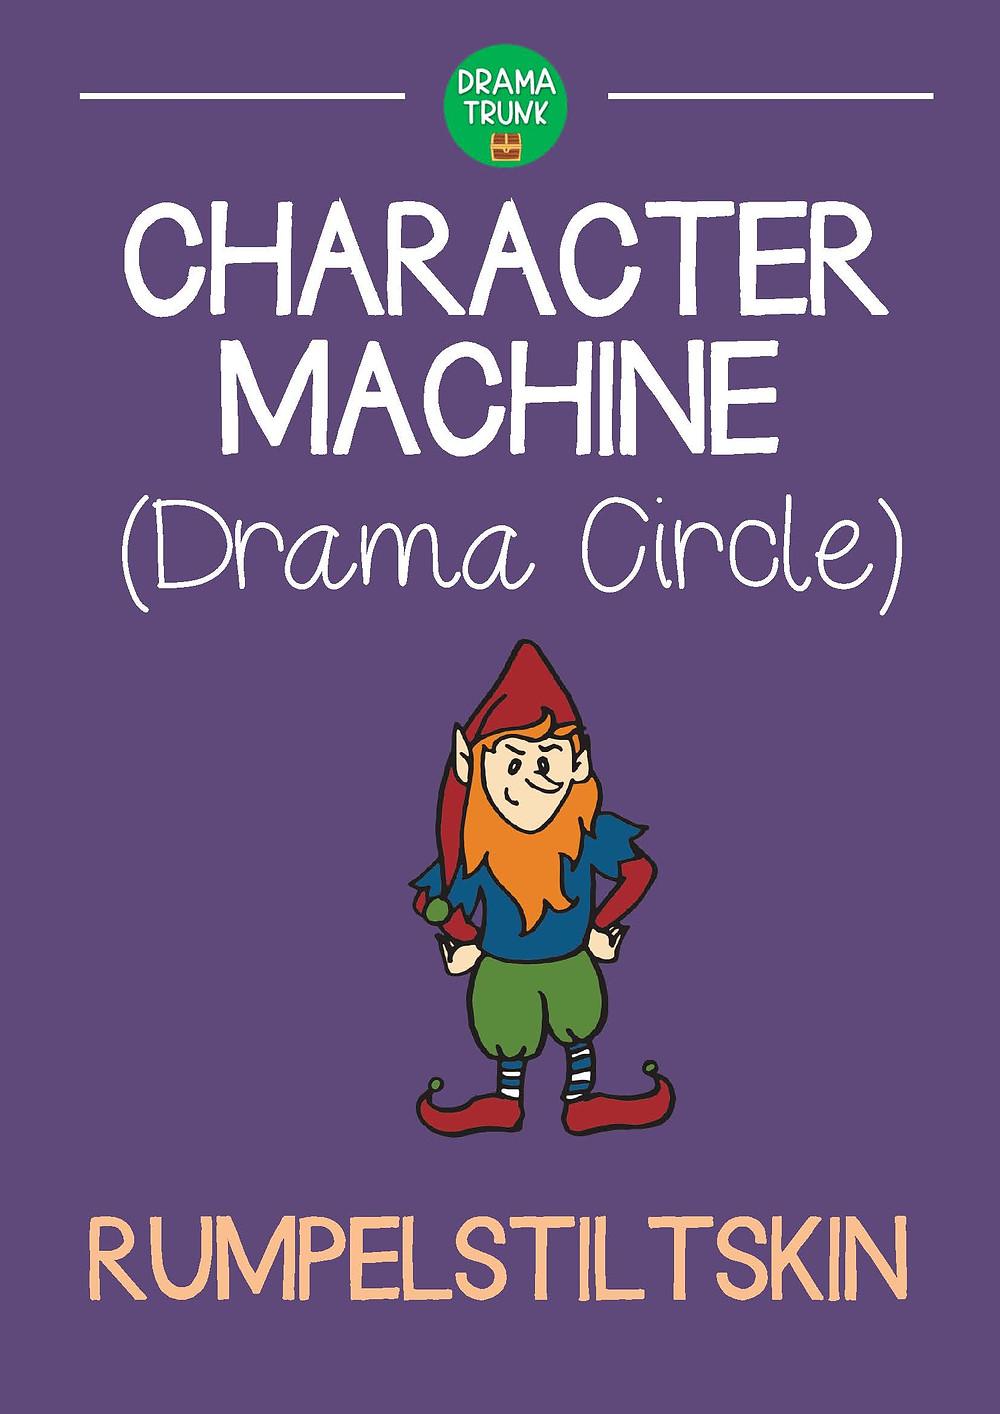 RUMPLESTITLTSKIN Drama Circle Readers Theatre Acting Script for Kids